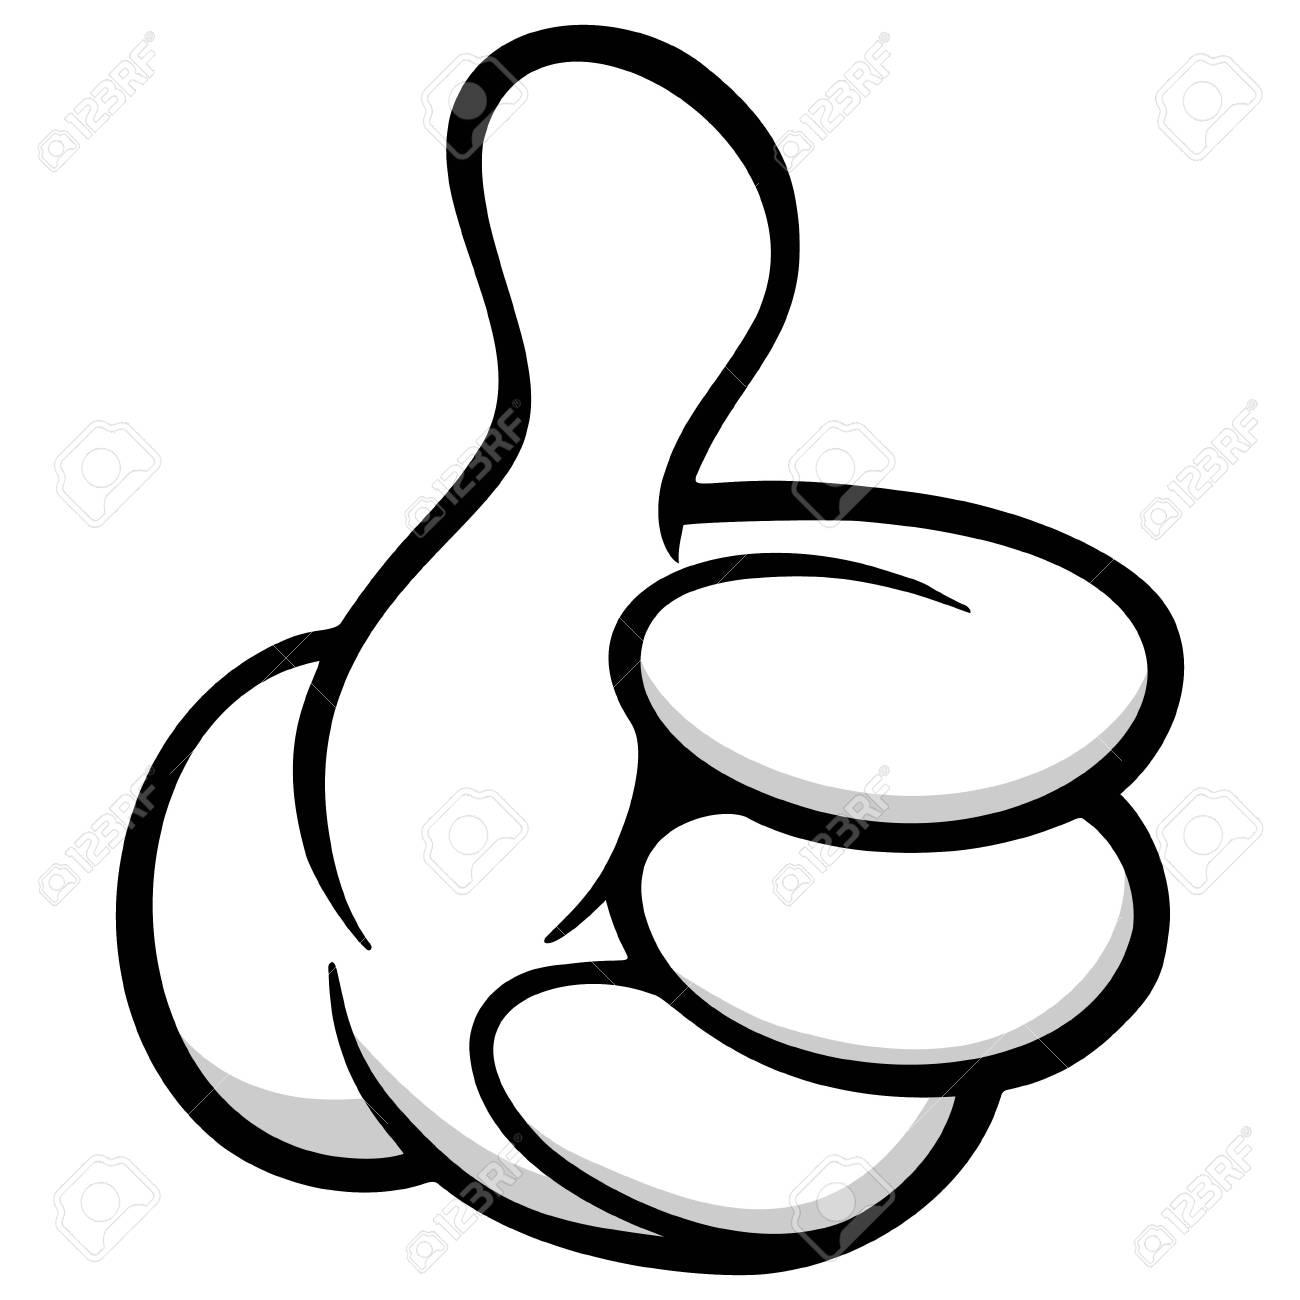 thumbs up cartoon hand royalty free cliparts vectors and stock illustration image 79987140 thumbs up cartoon hand